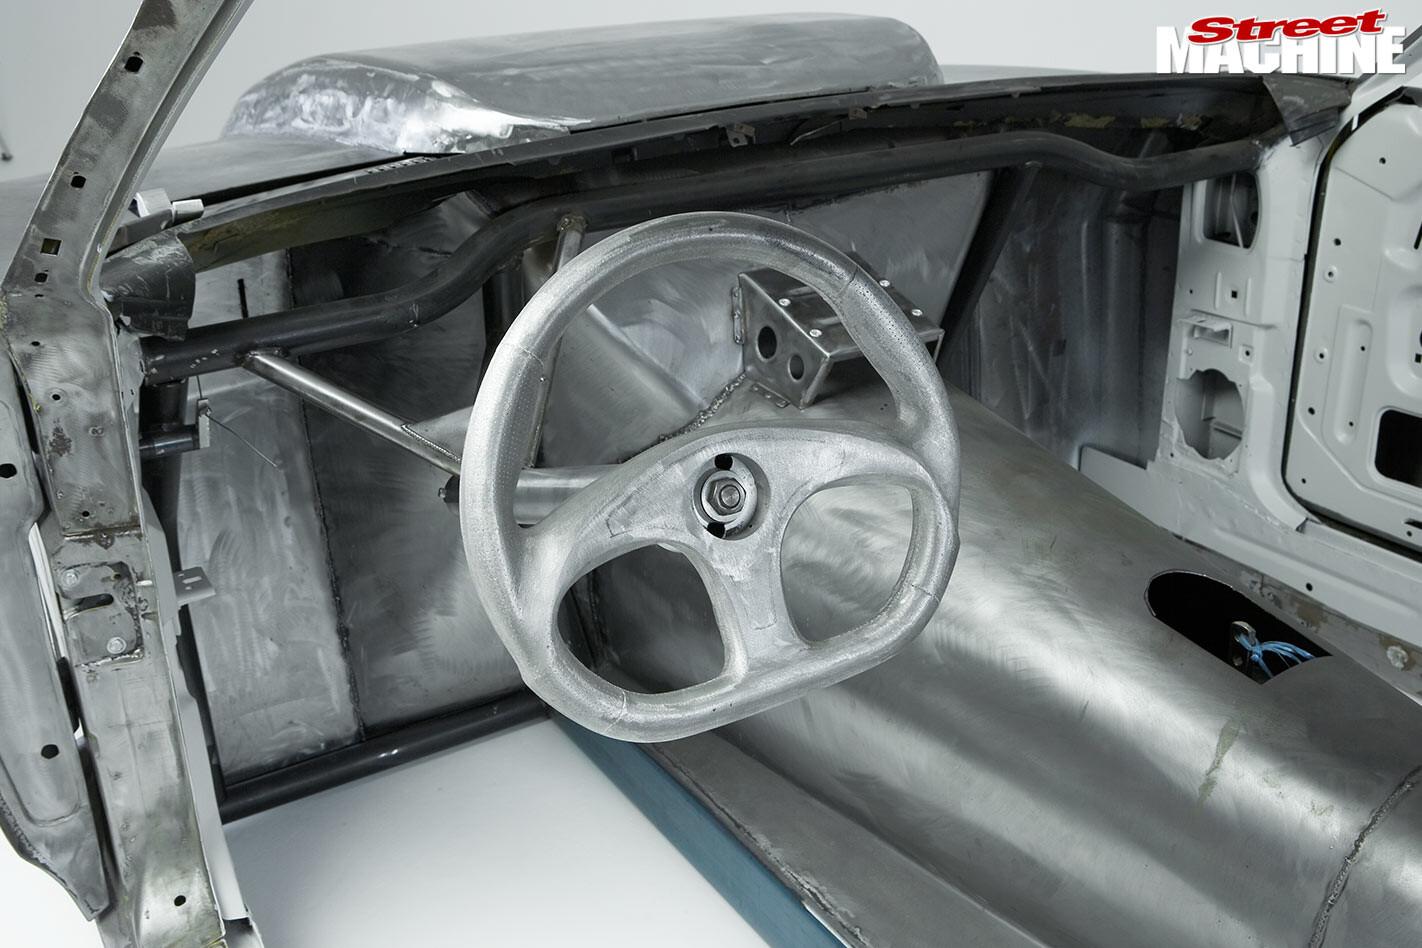 Ford Falcon XC steering wheel